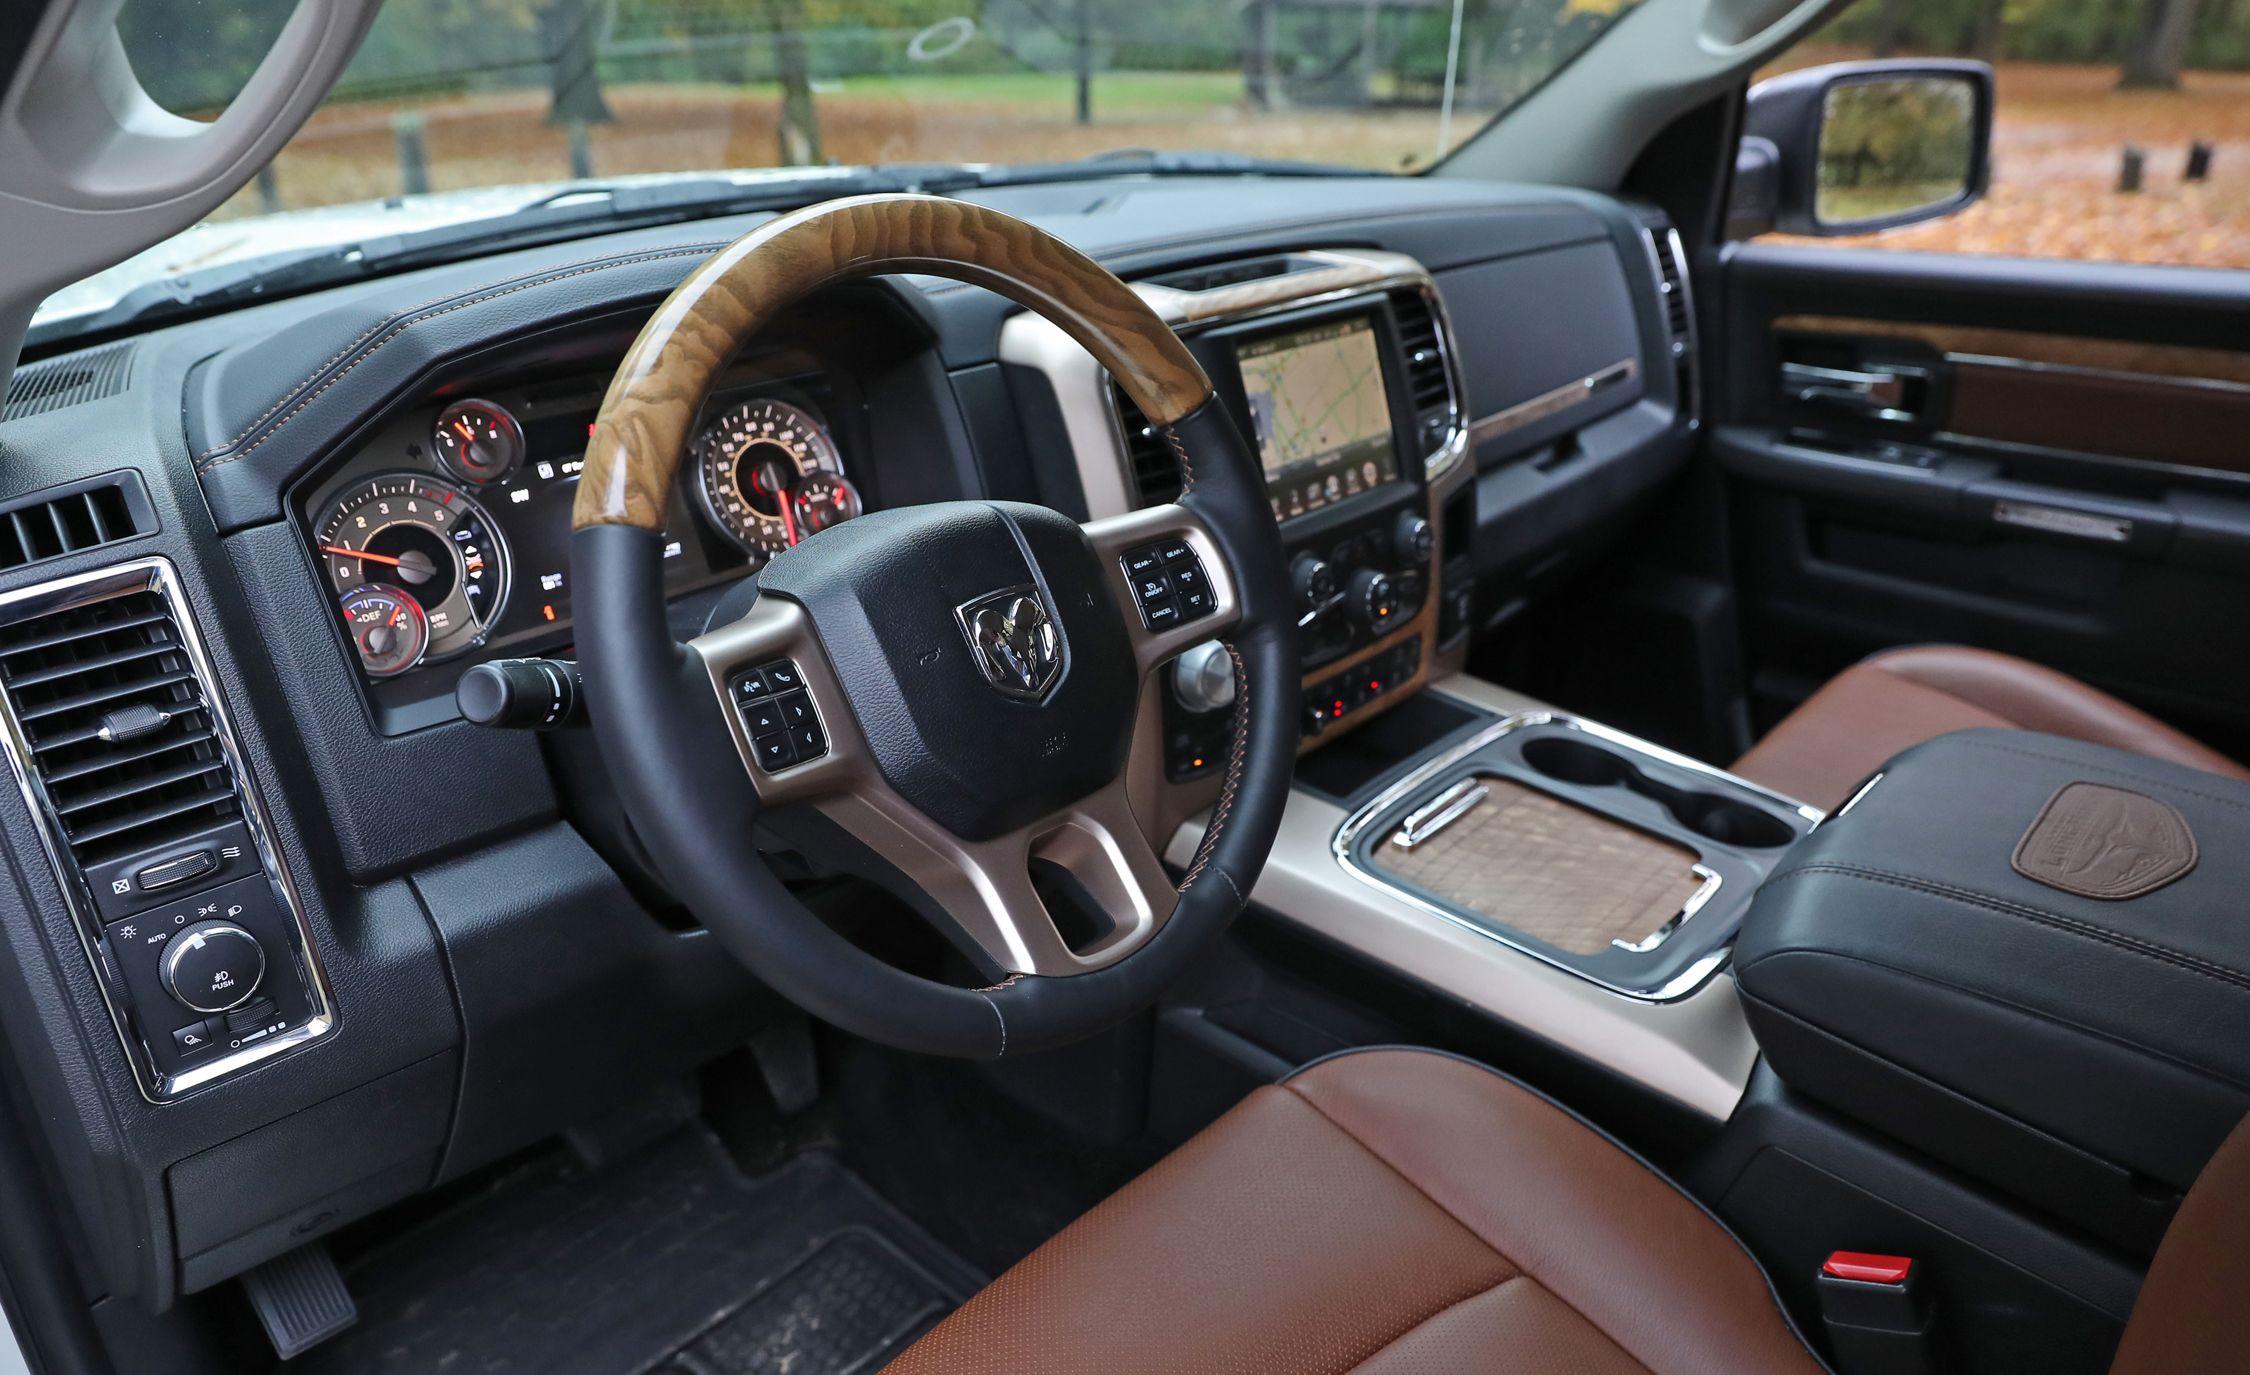 2017 Ram 1500 Interior Review Car And Driver